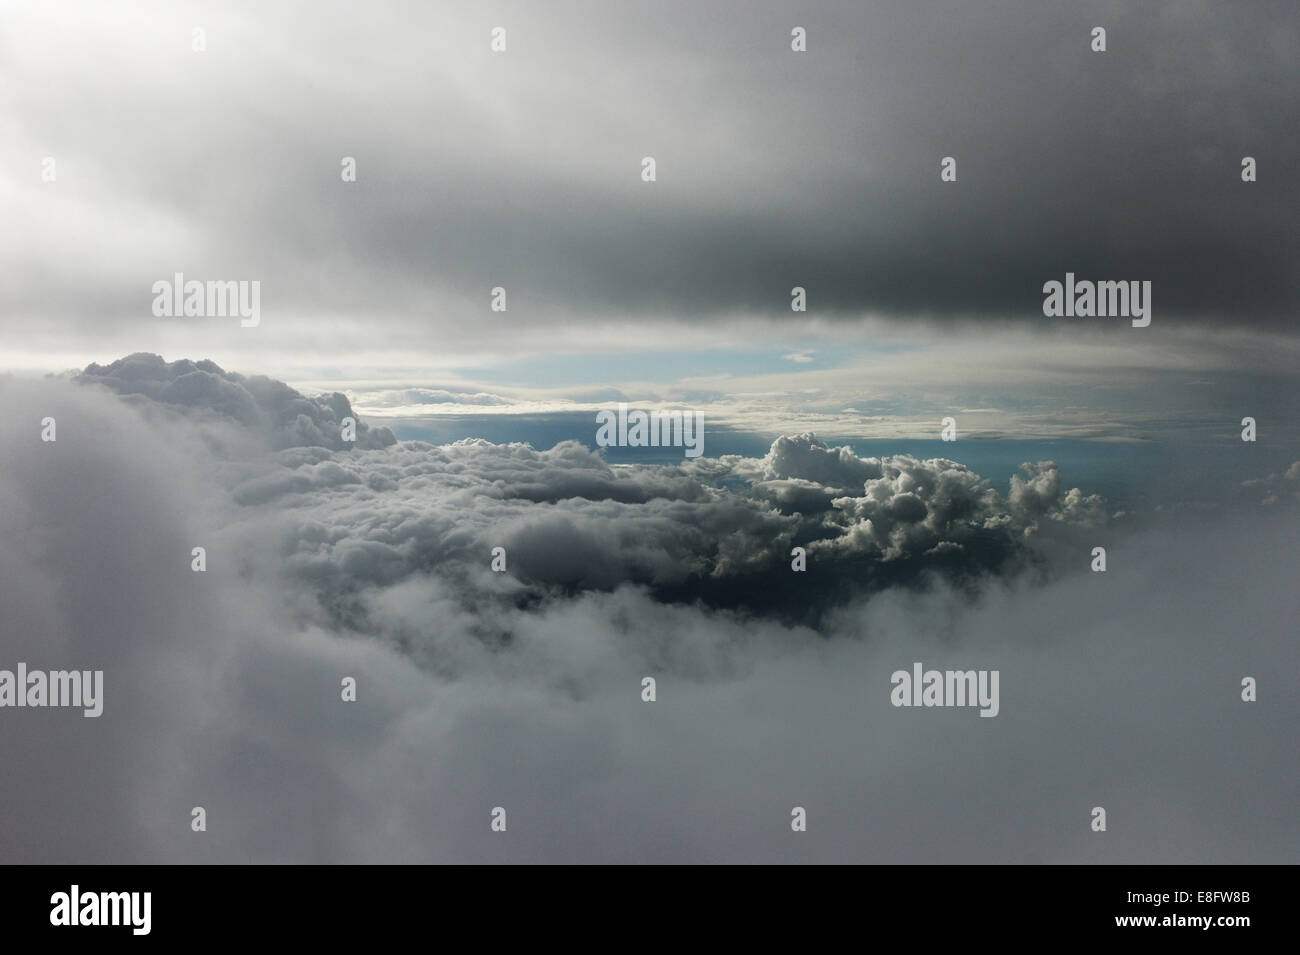 Gap in stormy cumulonimbus clouds showing bright sky - Stock Image